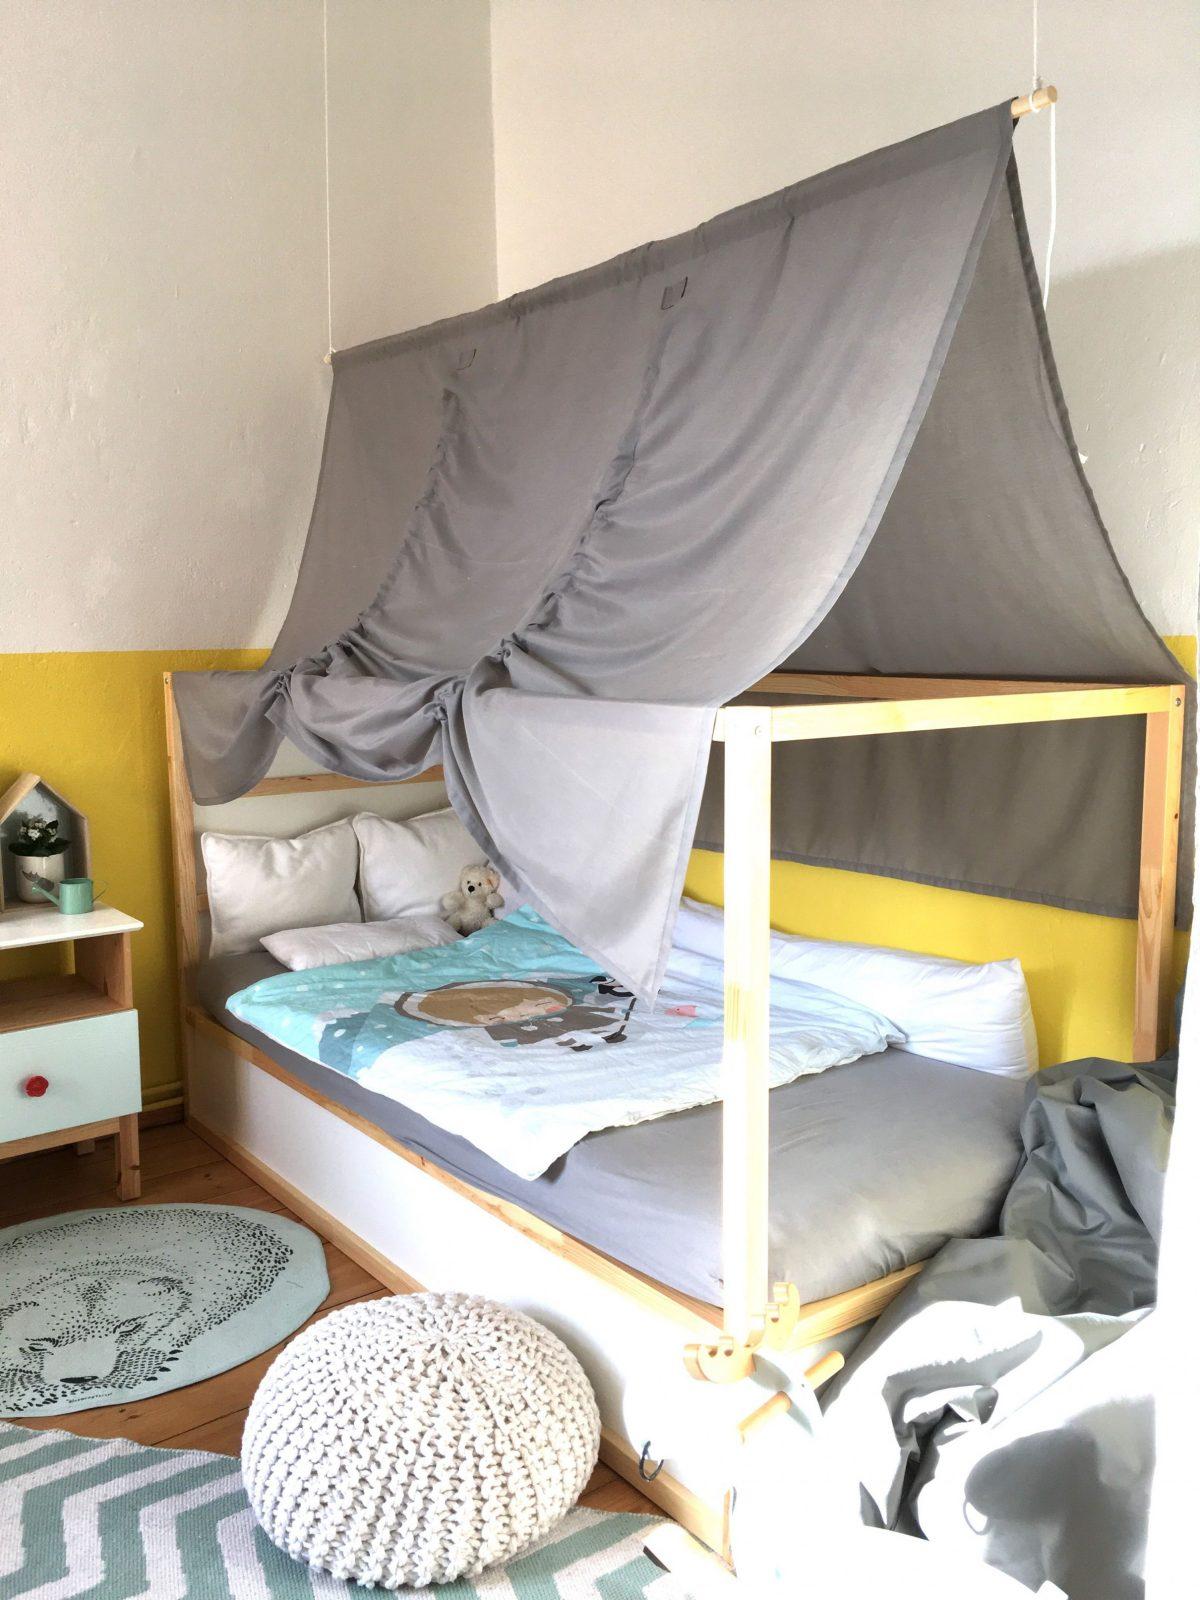 Ikea Kura Kinderbett Mit Diy Betthimmel <3  Spare Room In 2019 von Himmel Für Bett Ikea Photo